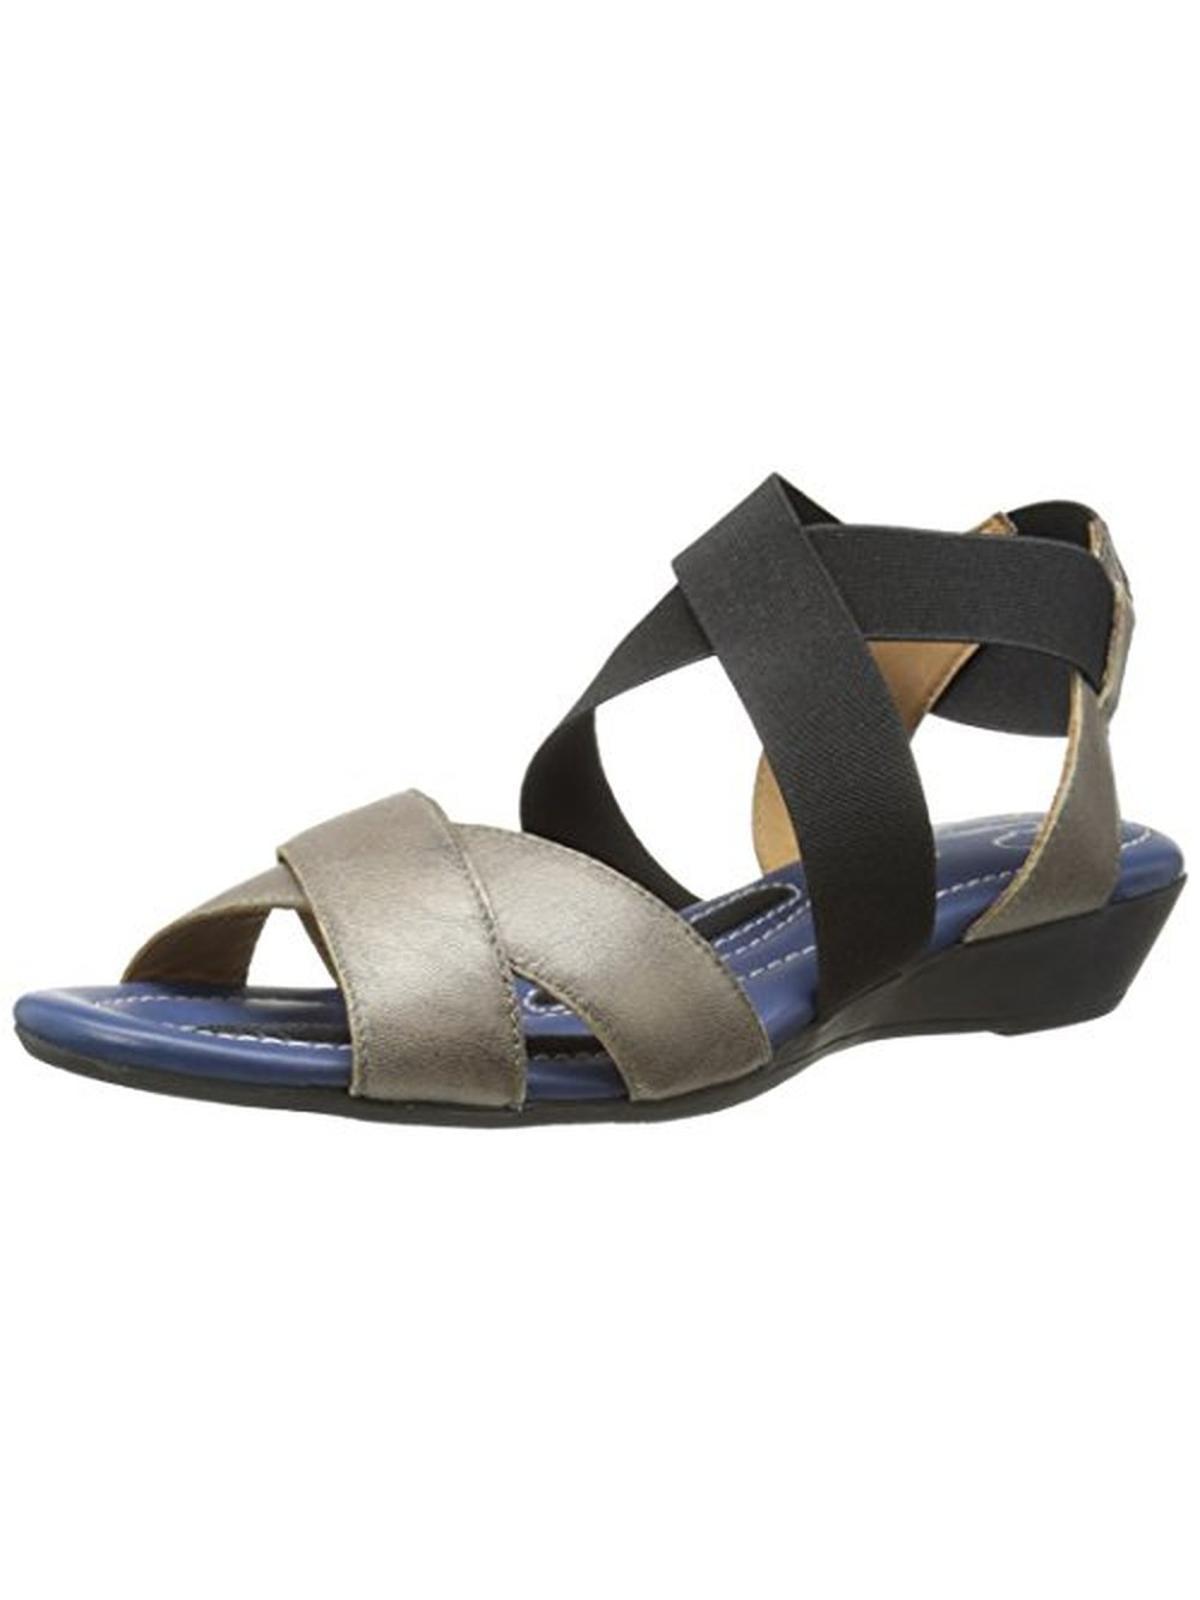 J. Renee Womens Careen Leather Wedge Sandals by J. Renee